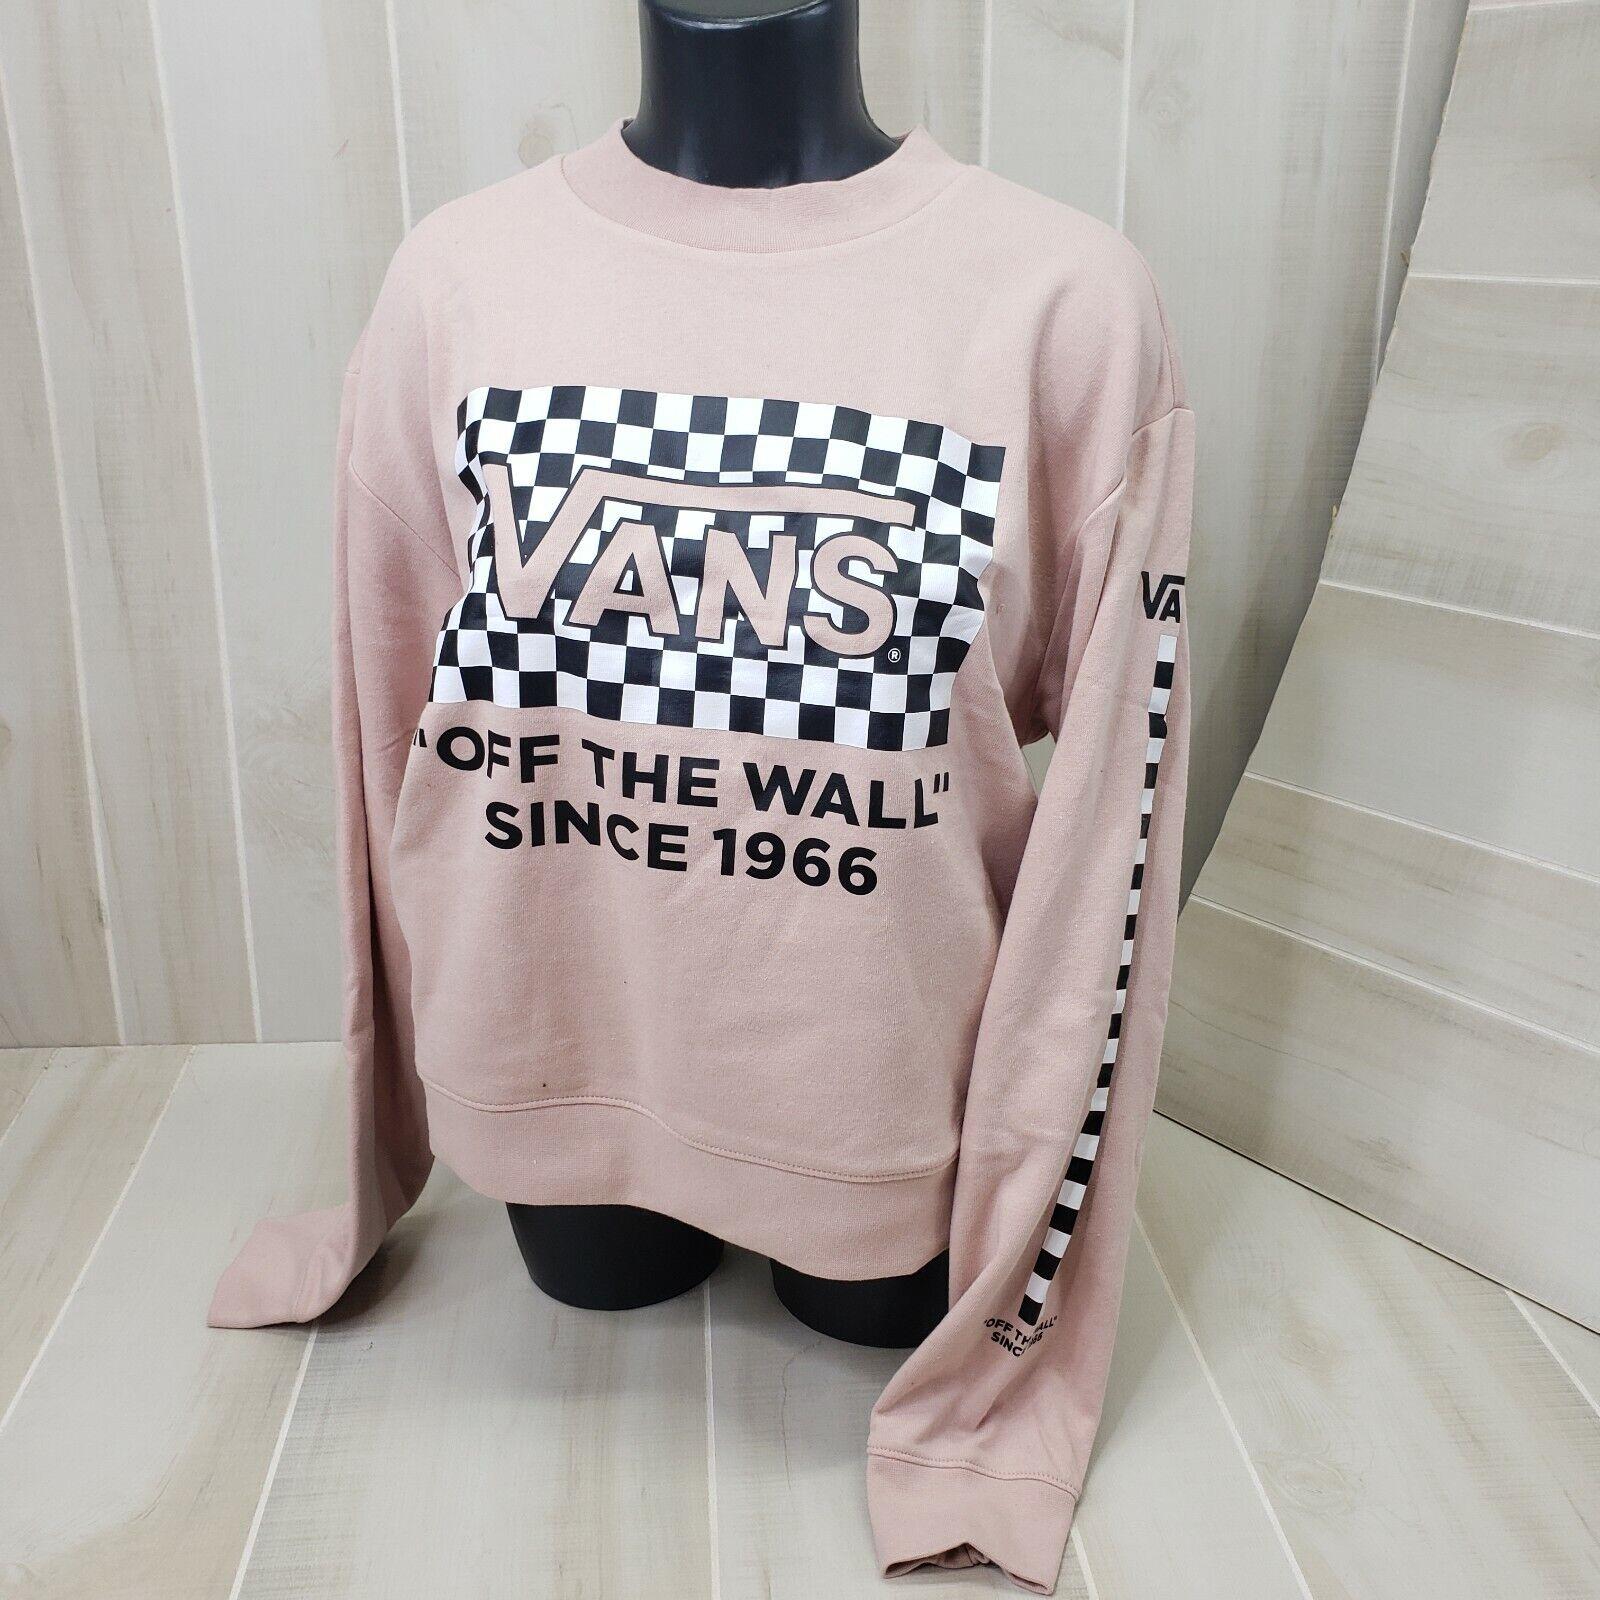 Vans Women's Sweatshirt Medium Pink Pullover Crew M Cropped Checker Check Logo